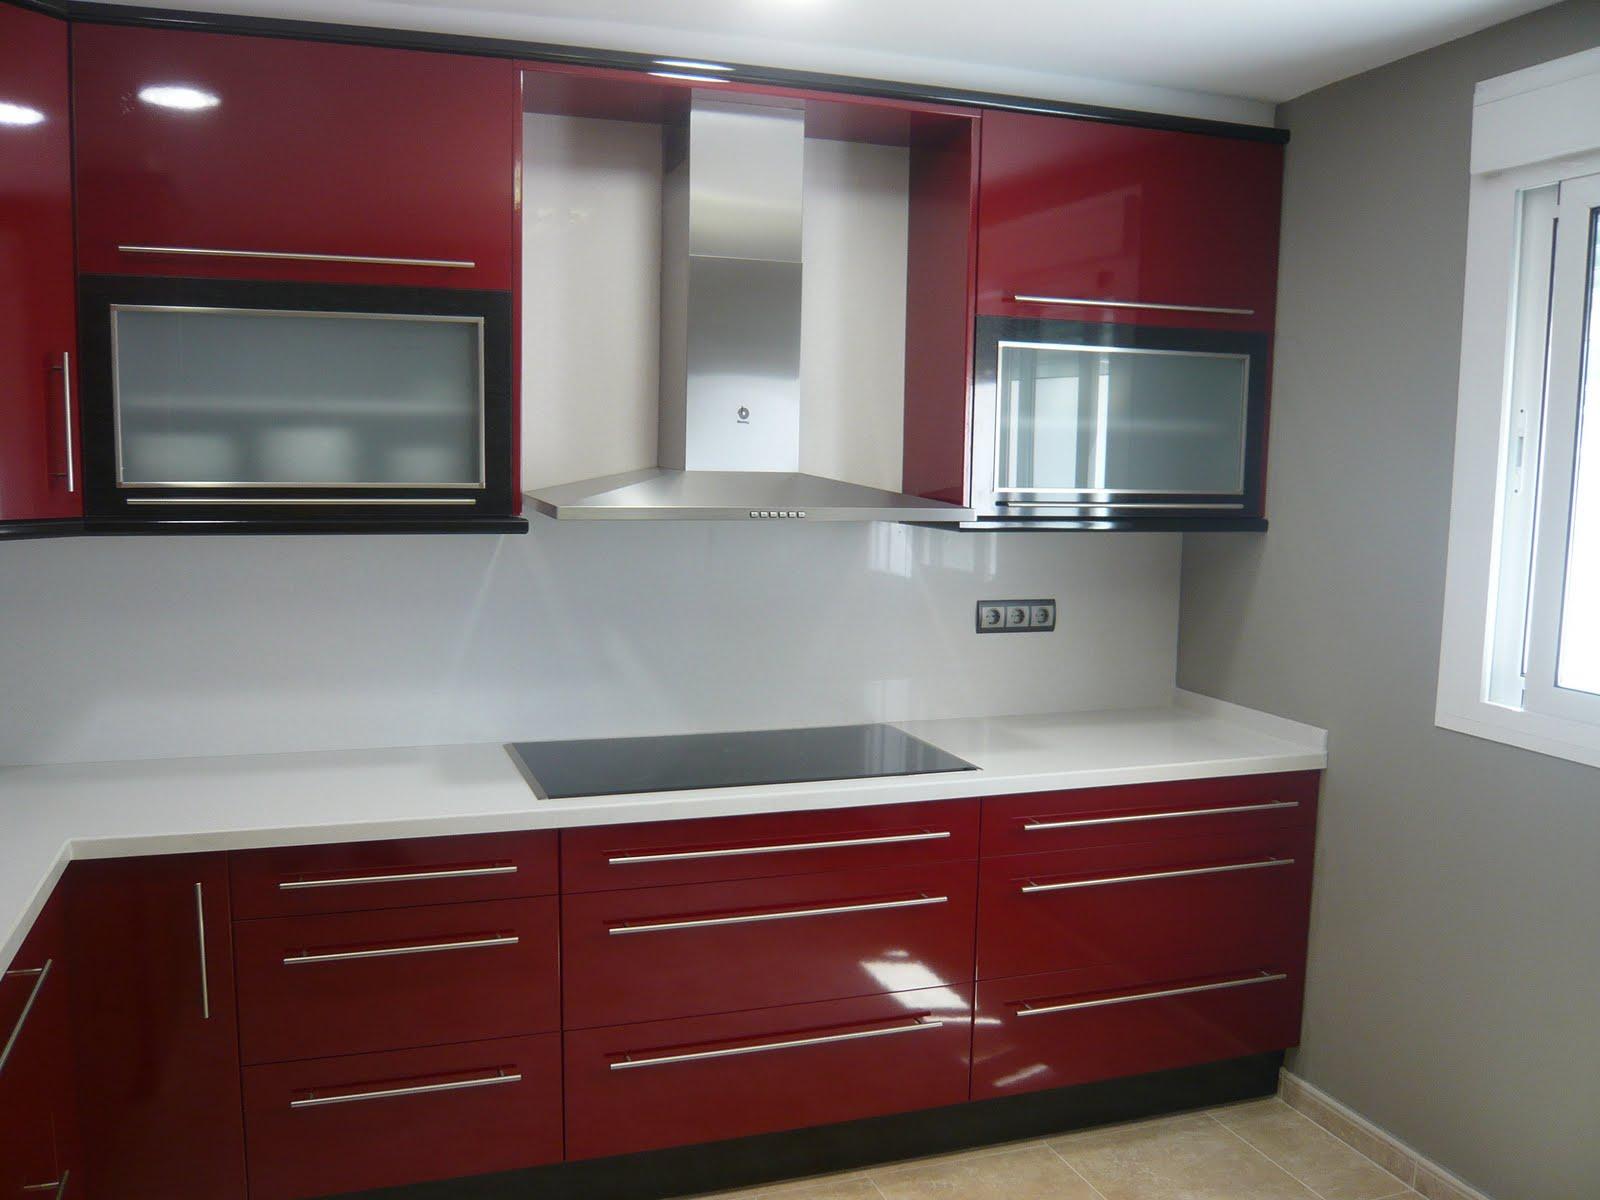 Reuscuina cocina de formica combinada rojo negro - Cocina de formica ...